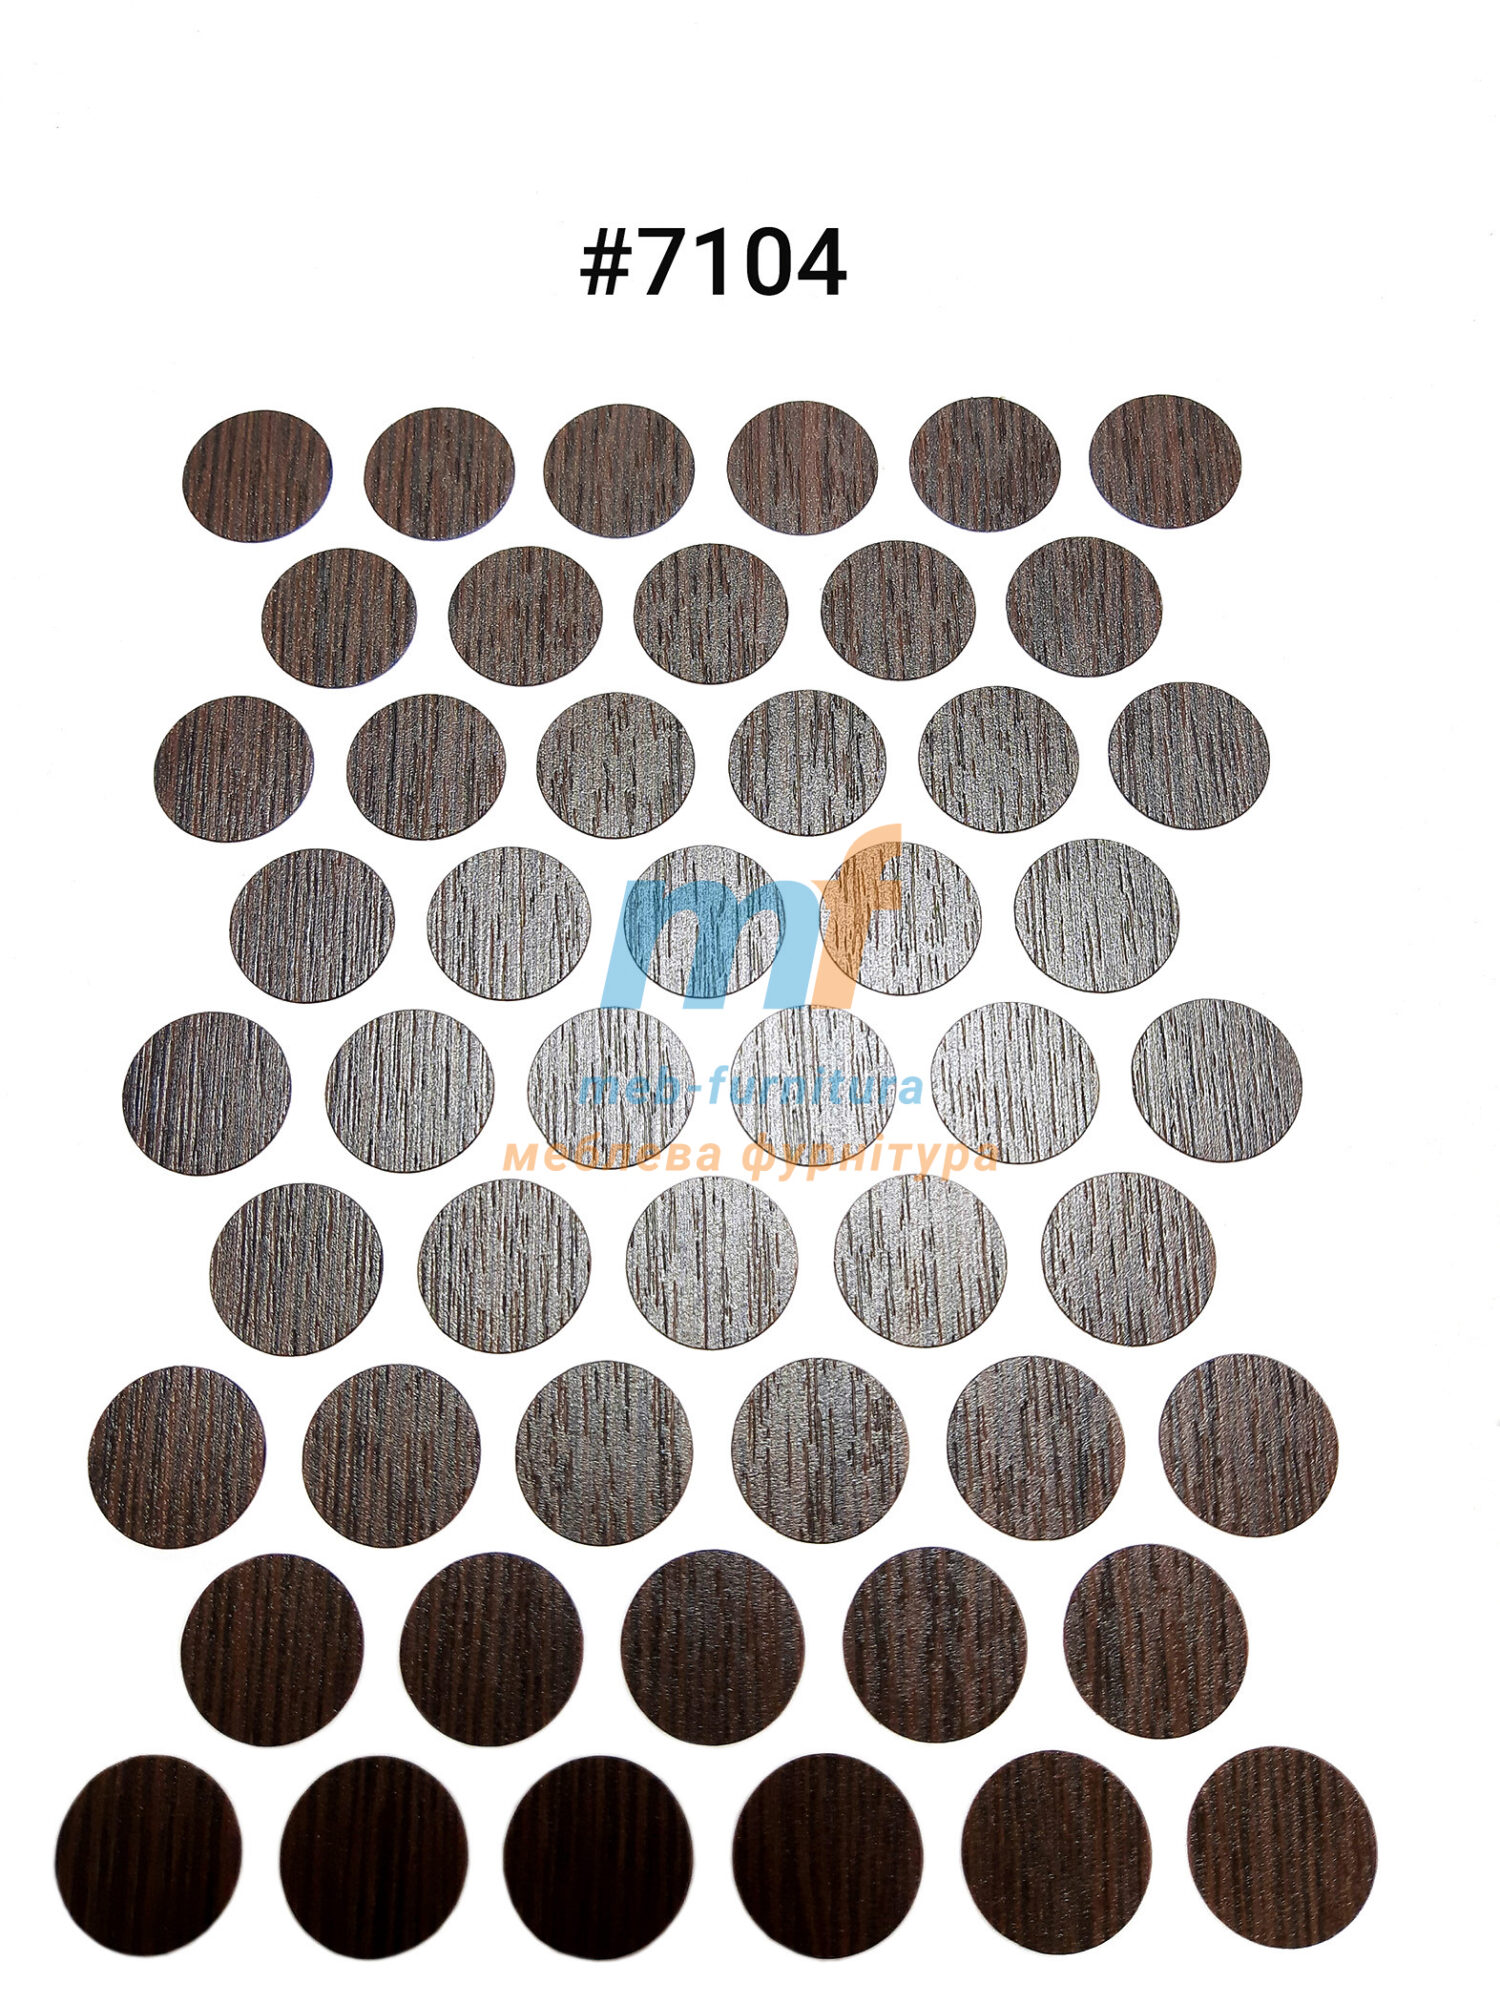 Заглушка на самоклейке для конфирмата,шурупа (7104)